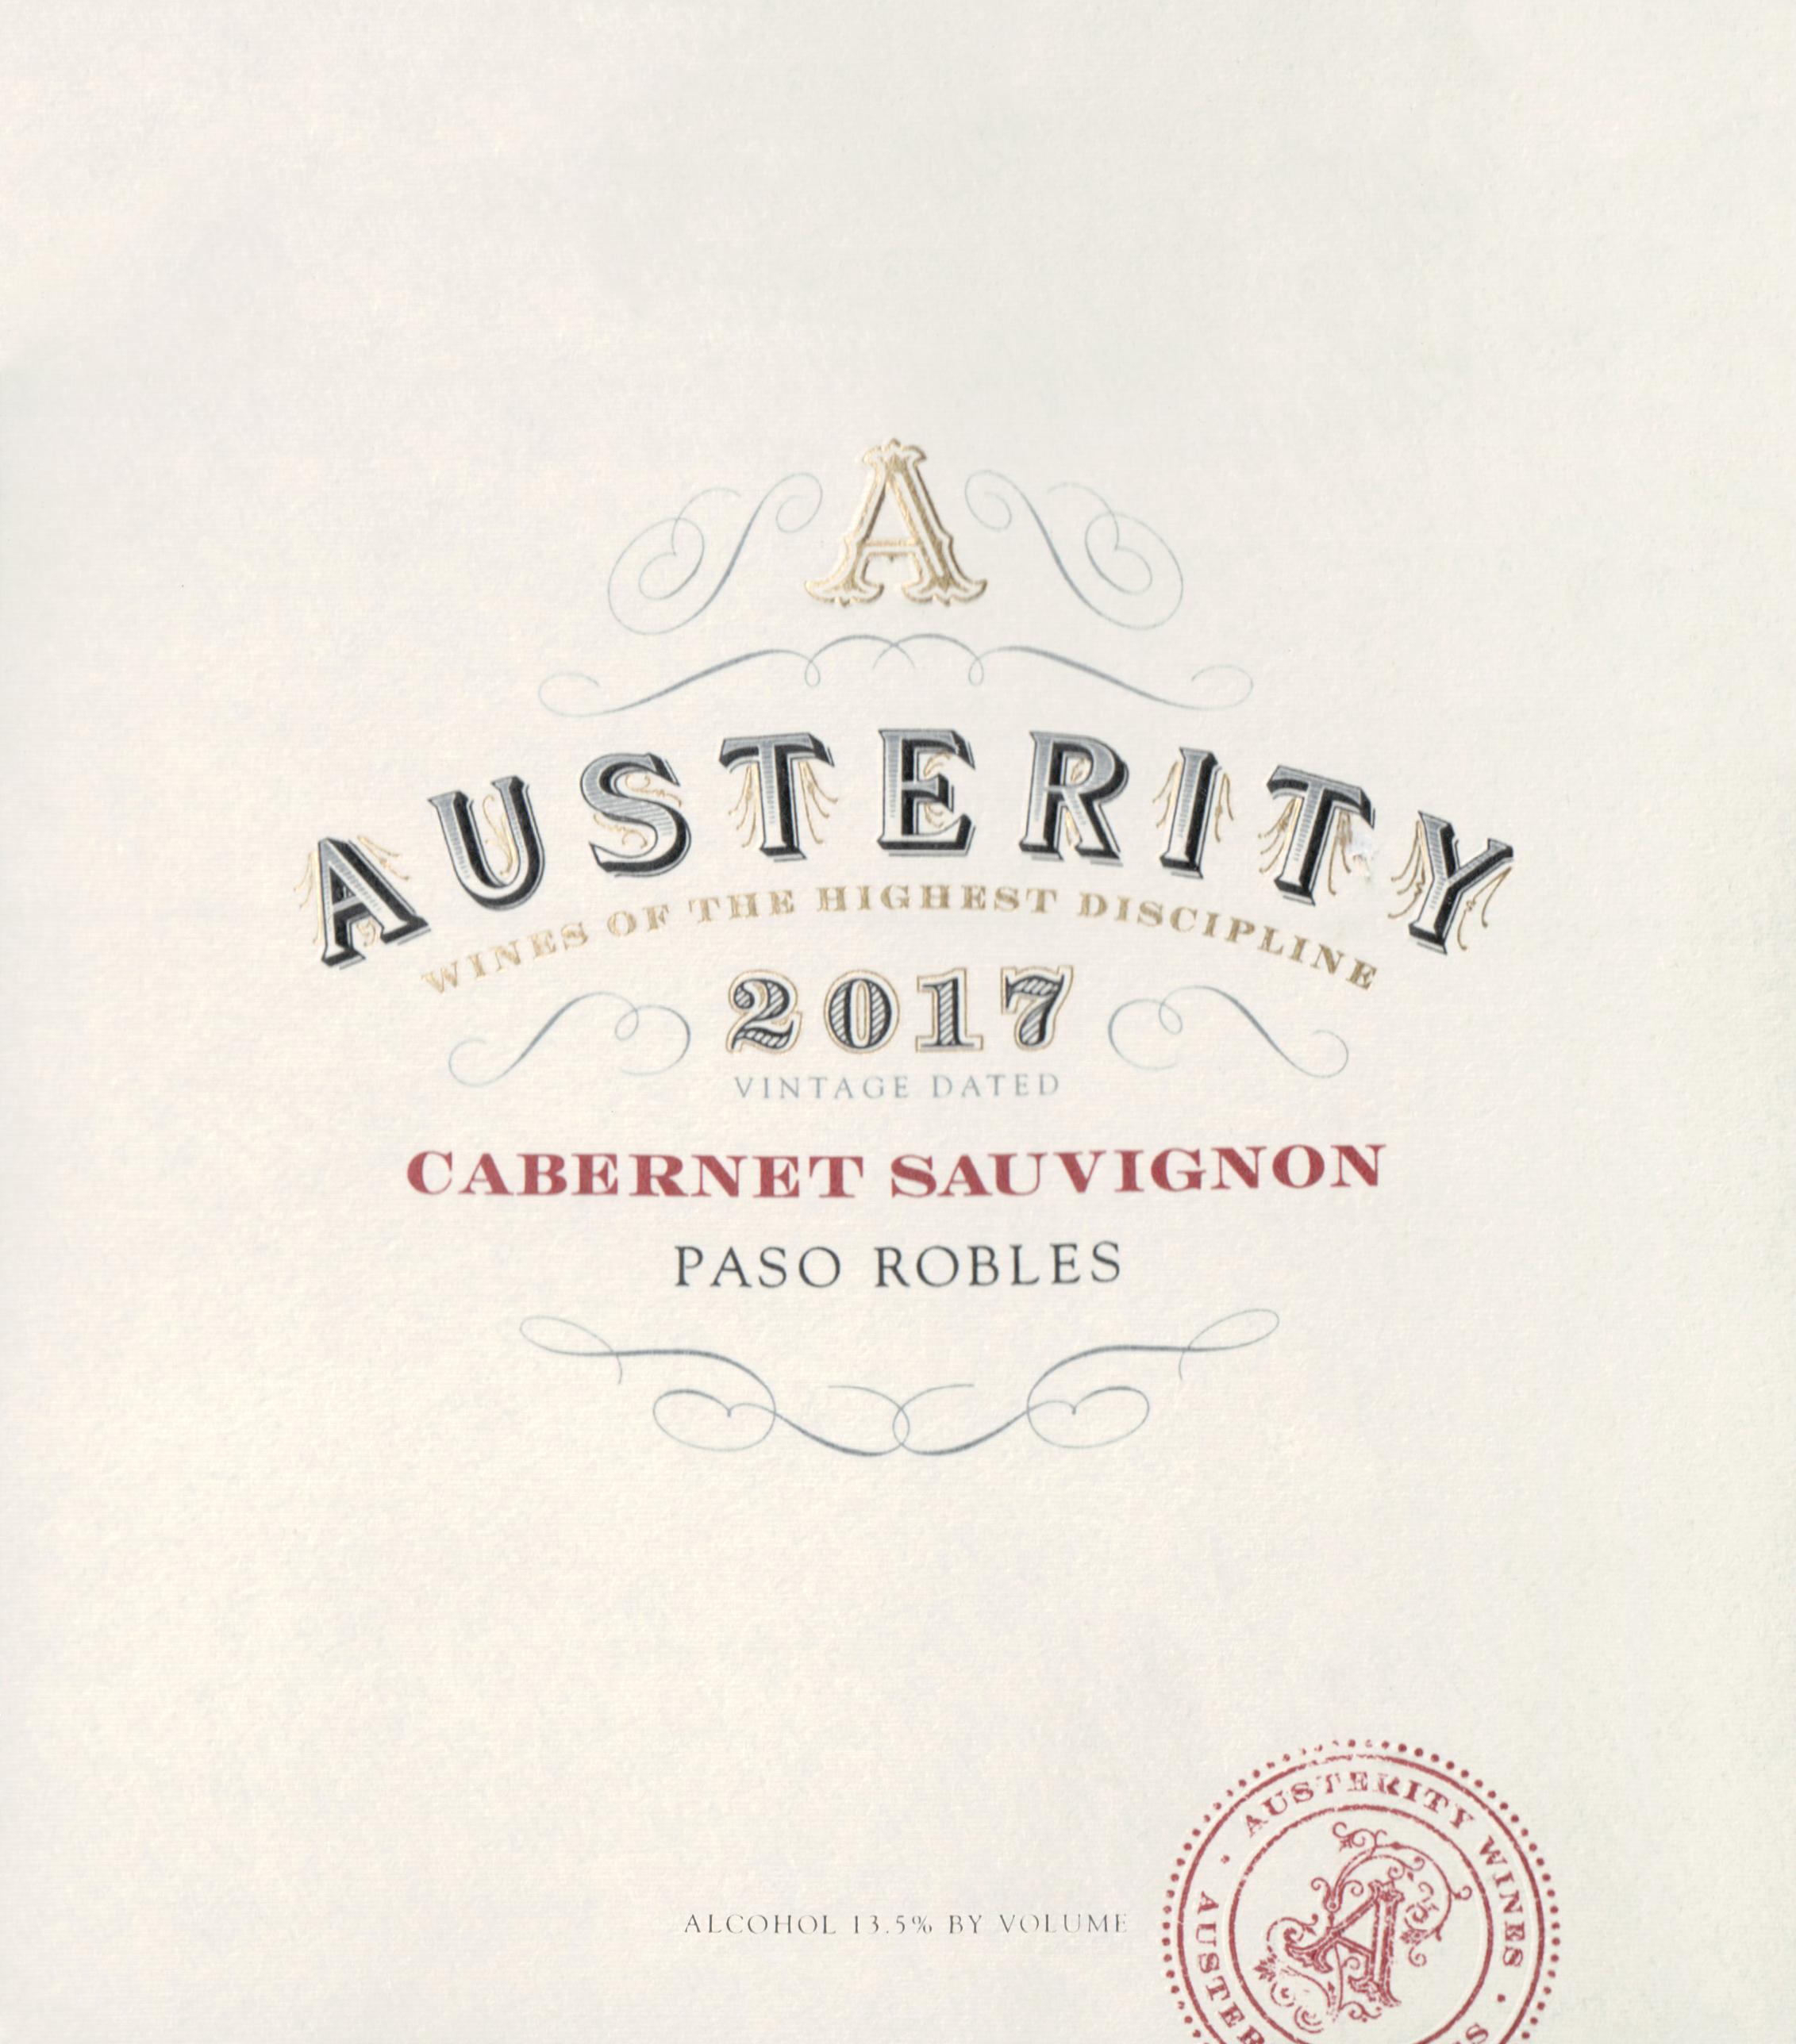 Austerity Cabernet Sauvignon 2017